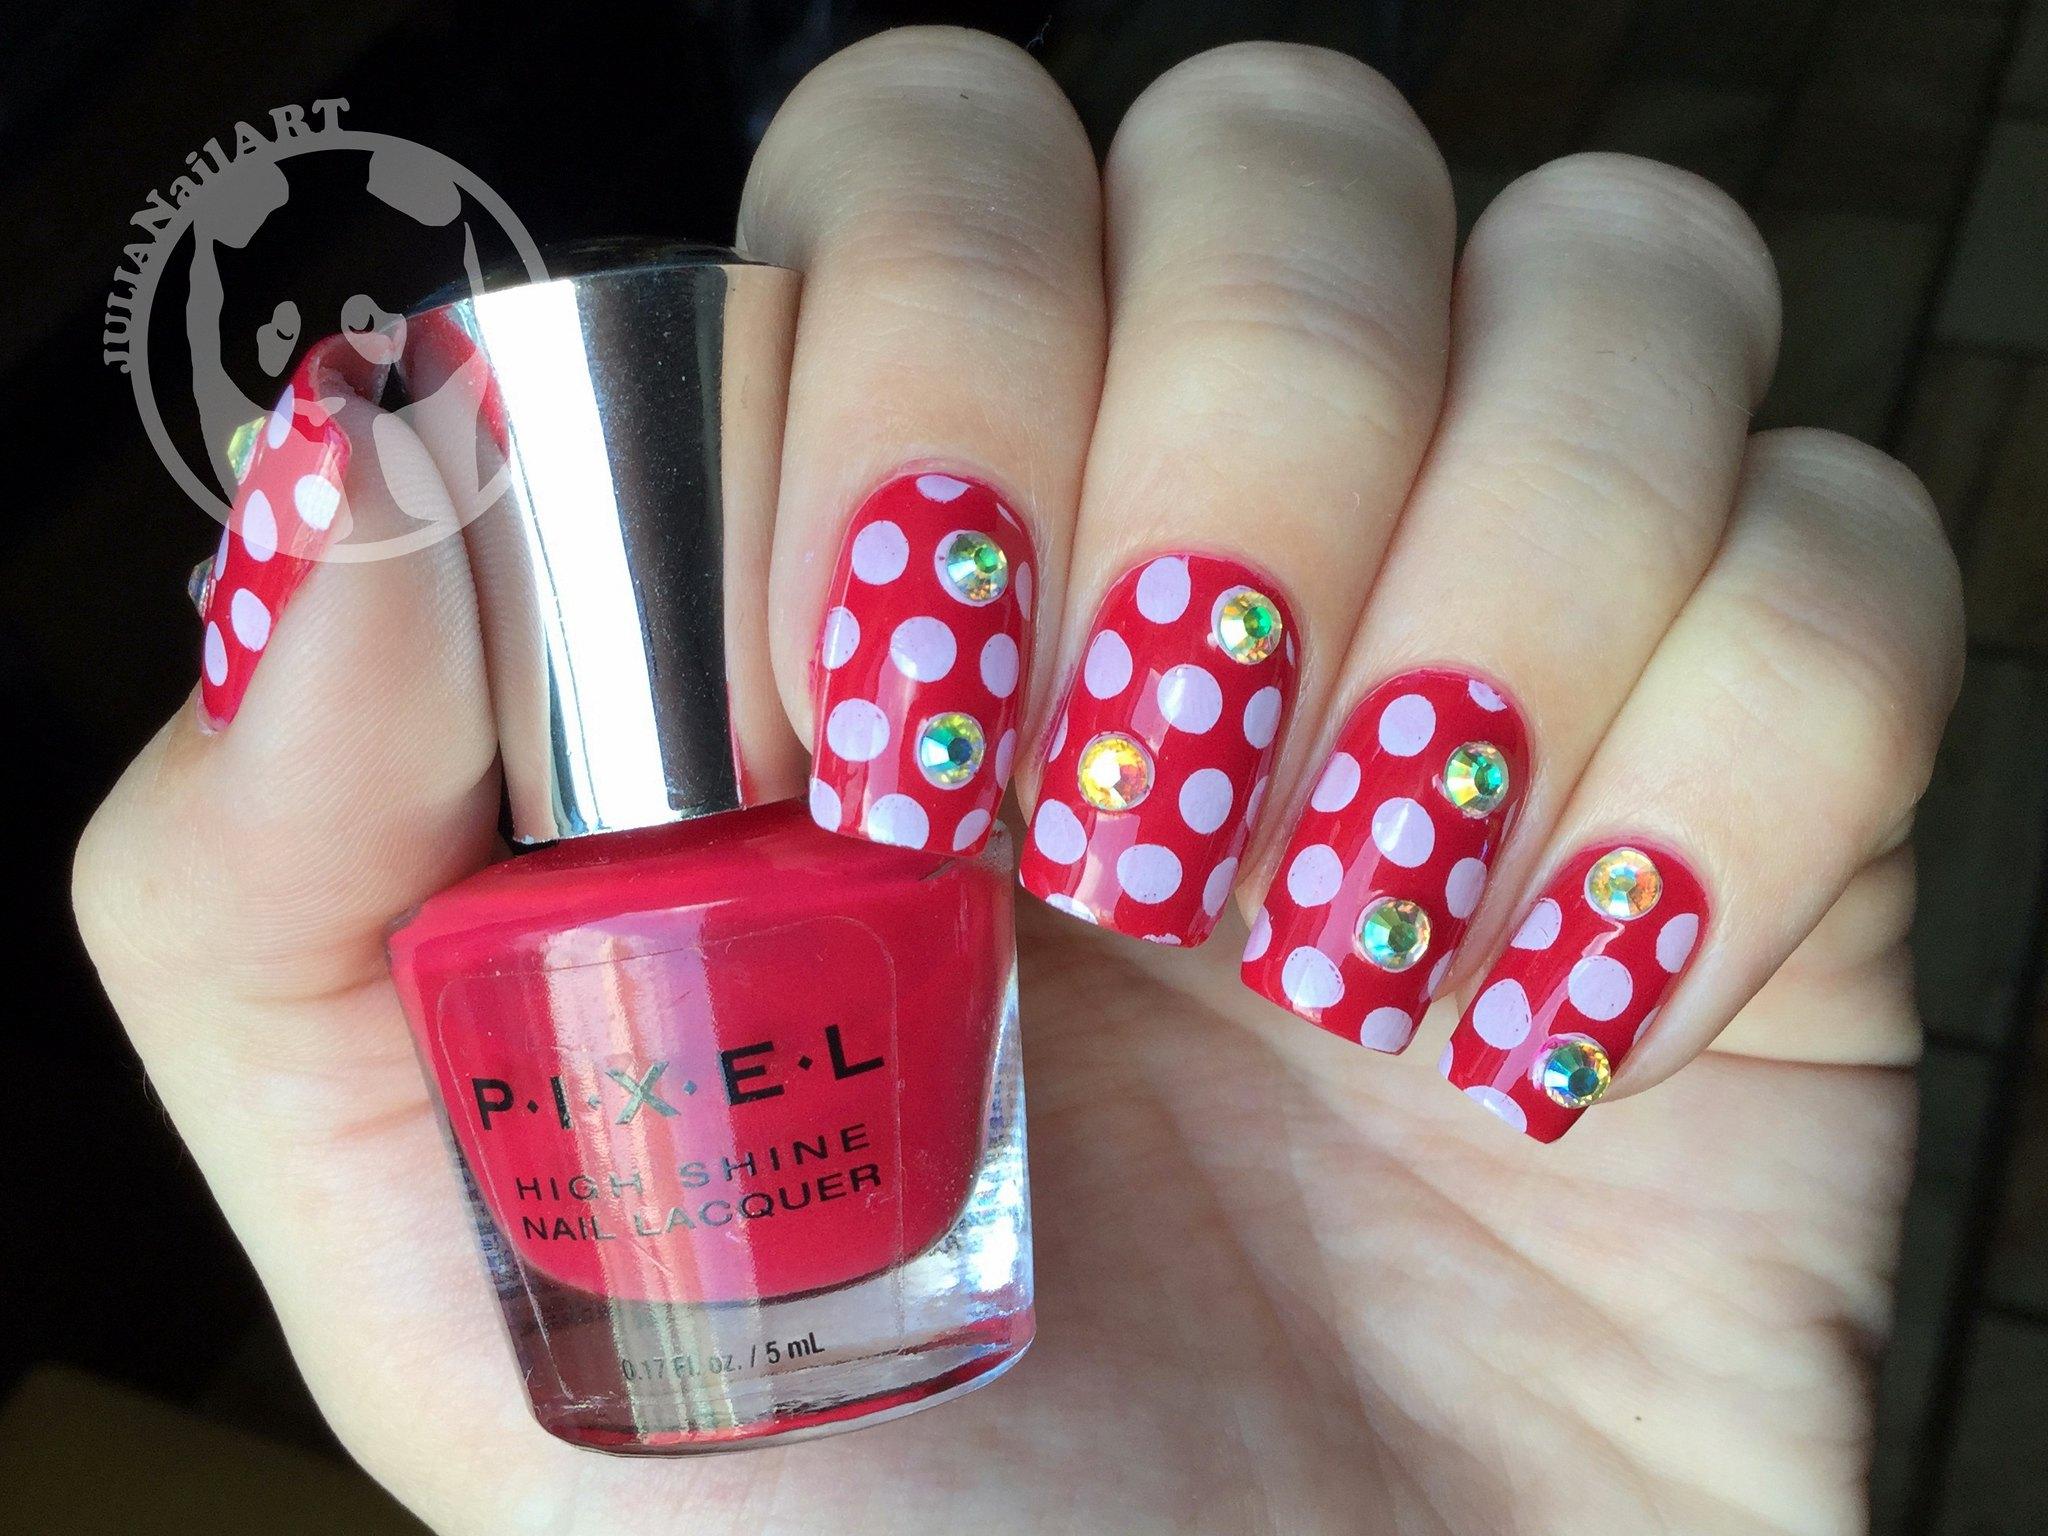 RED Bling Nails | Bling Nail Designs For Shining Shimmering Splendid Nails | bling nails | acrylic nails with bling